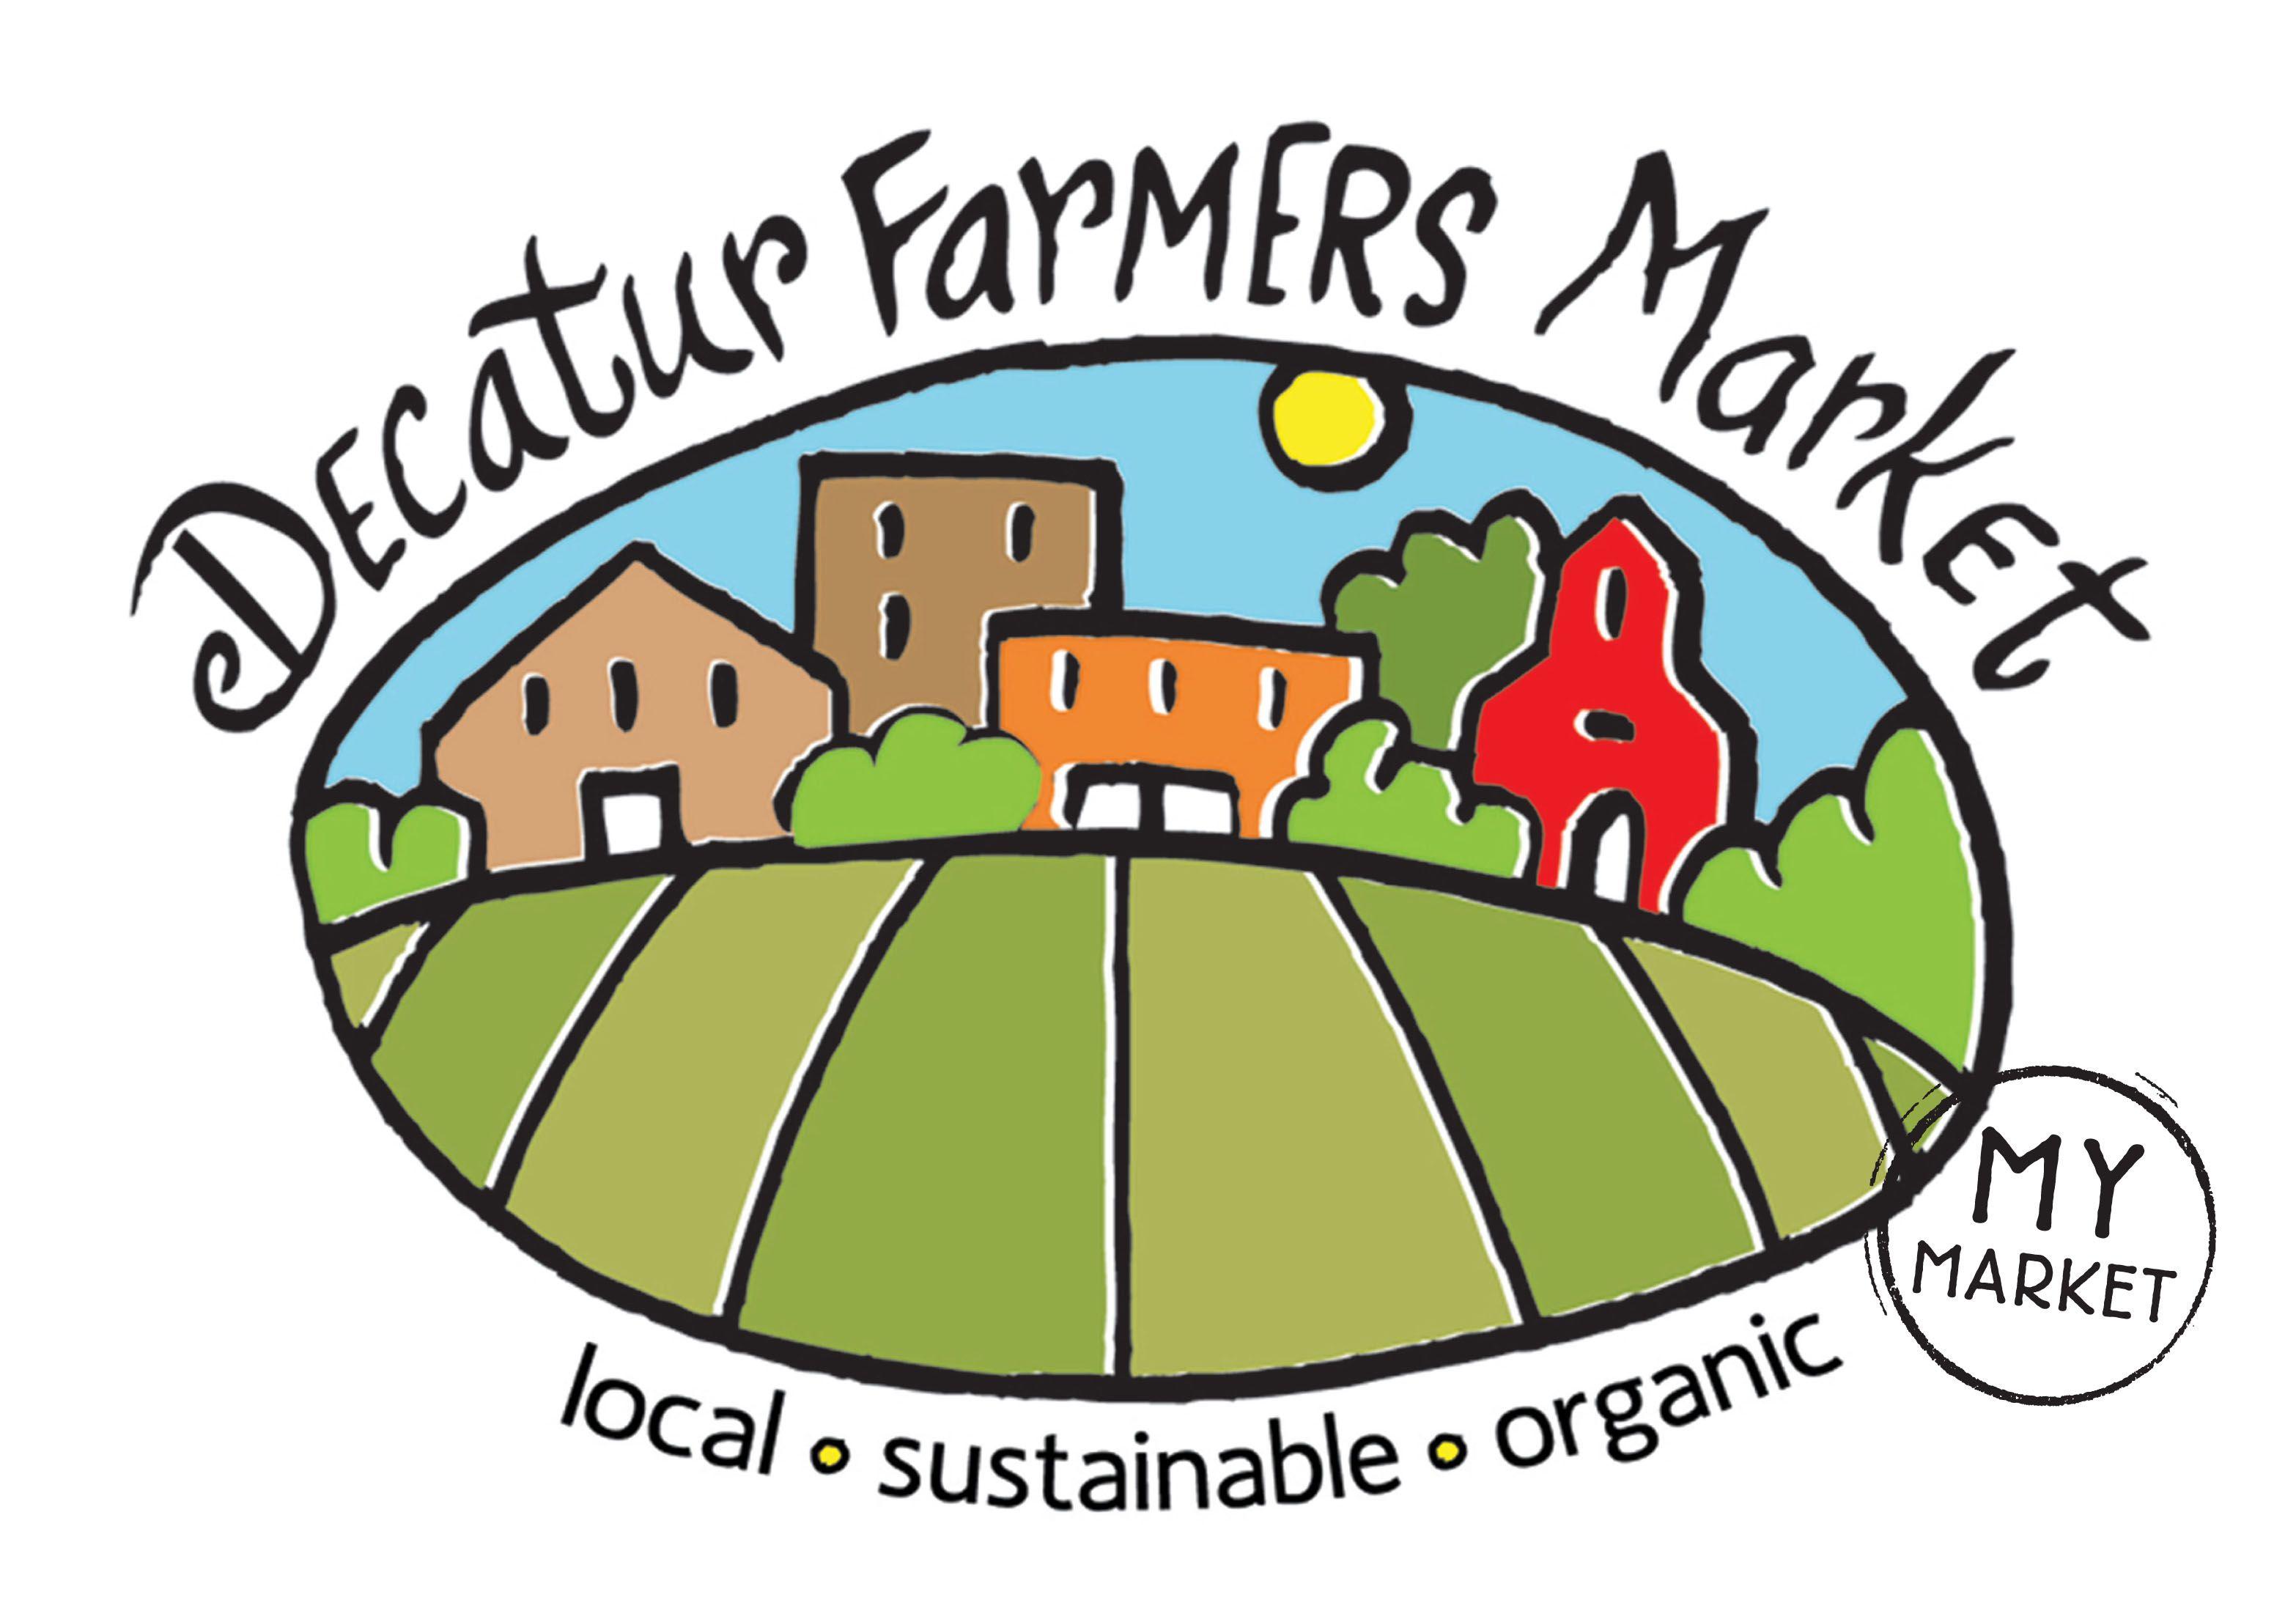 Decatur farmers market farmers market farmer marketing